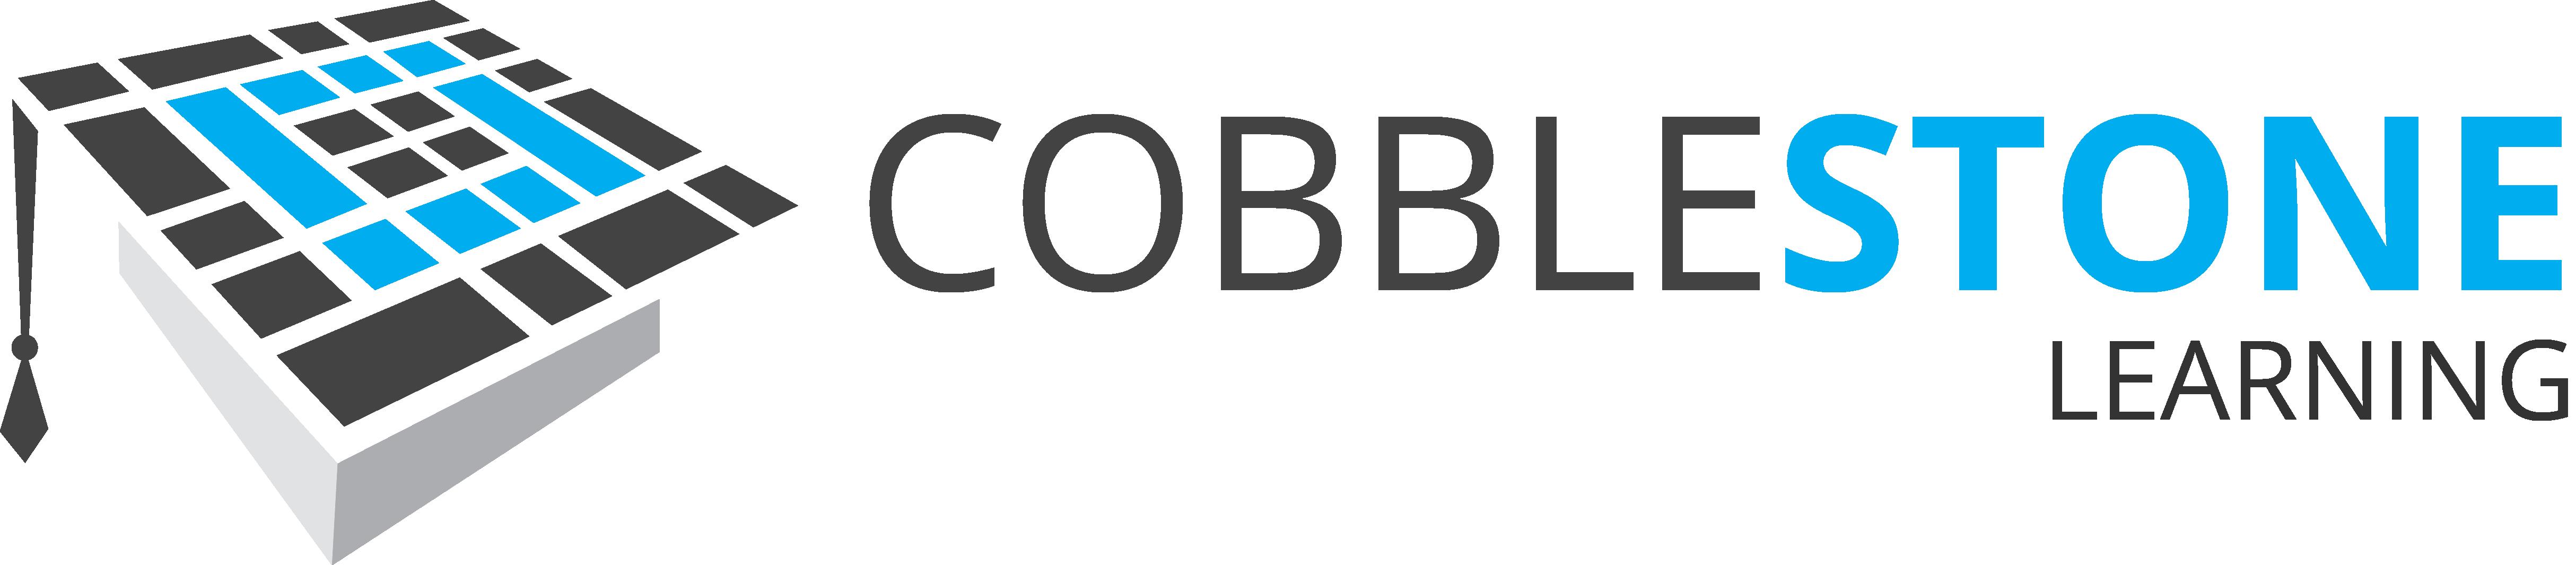 Cobblestone Learning